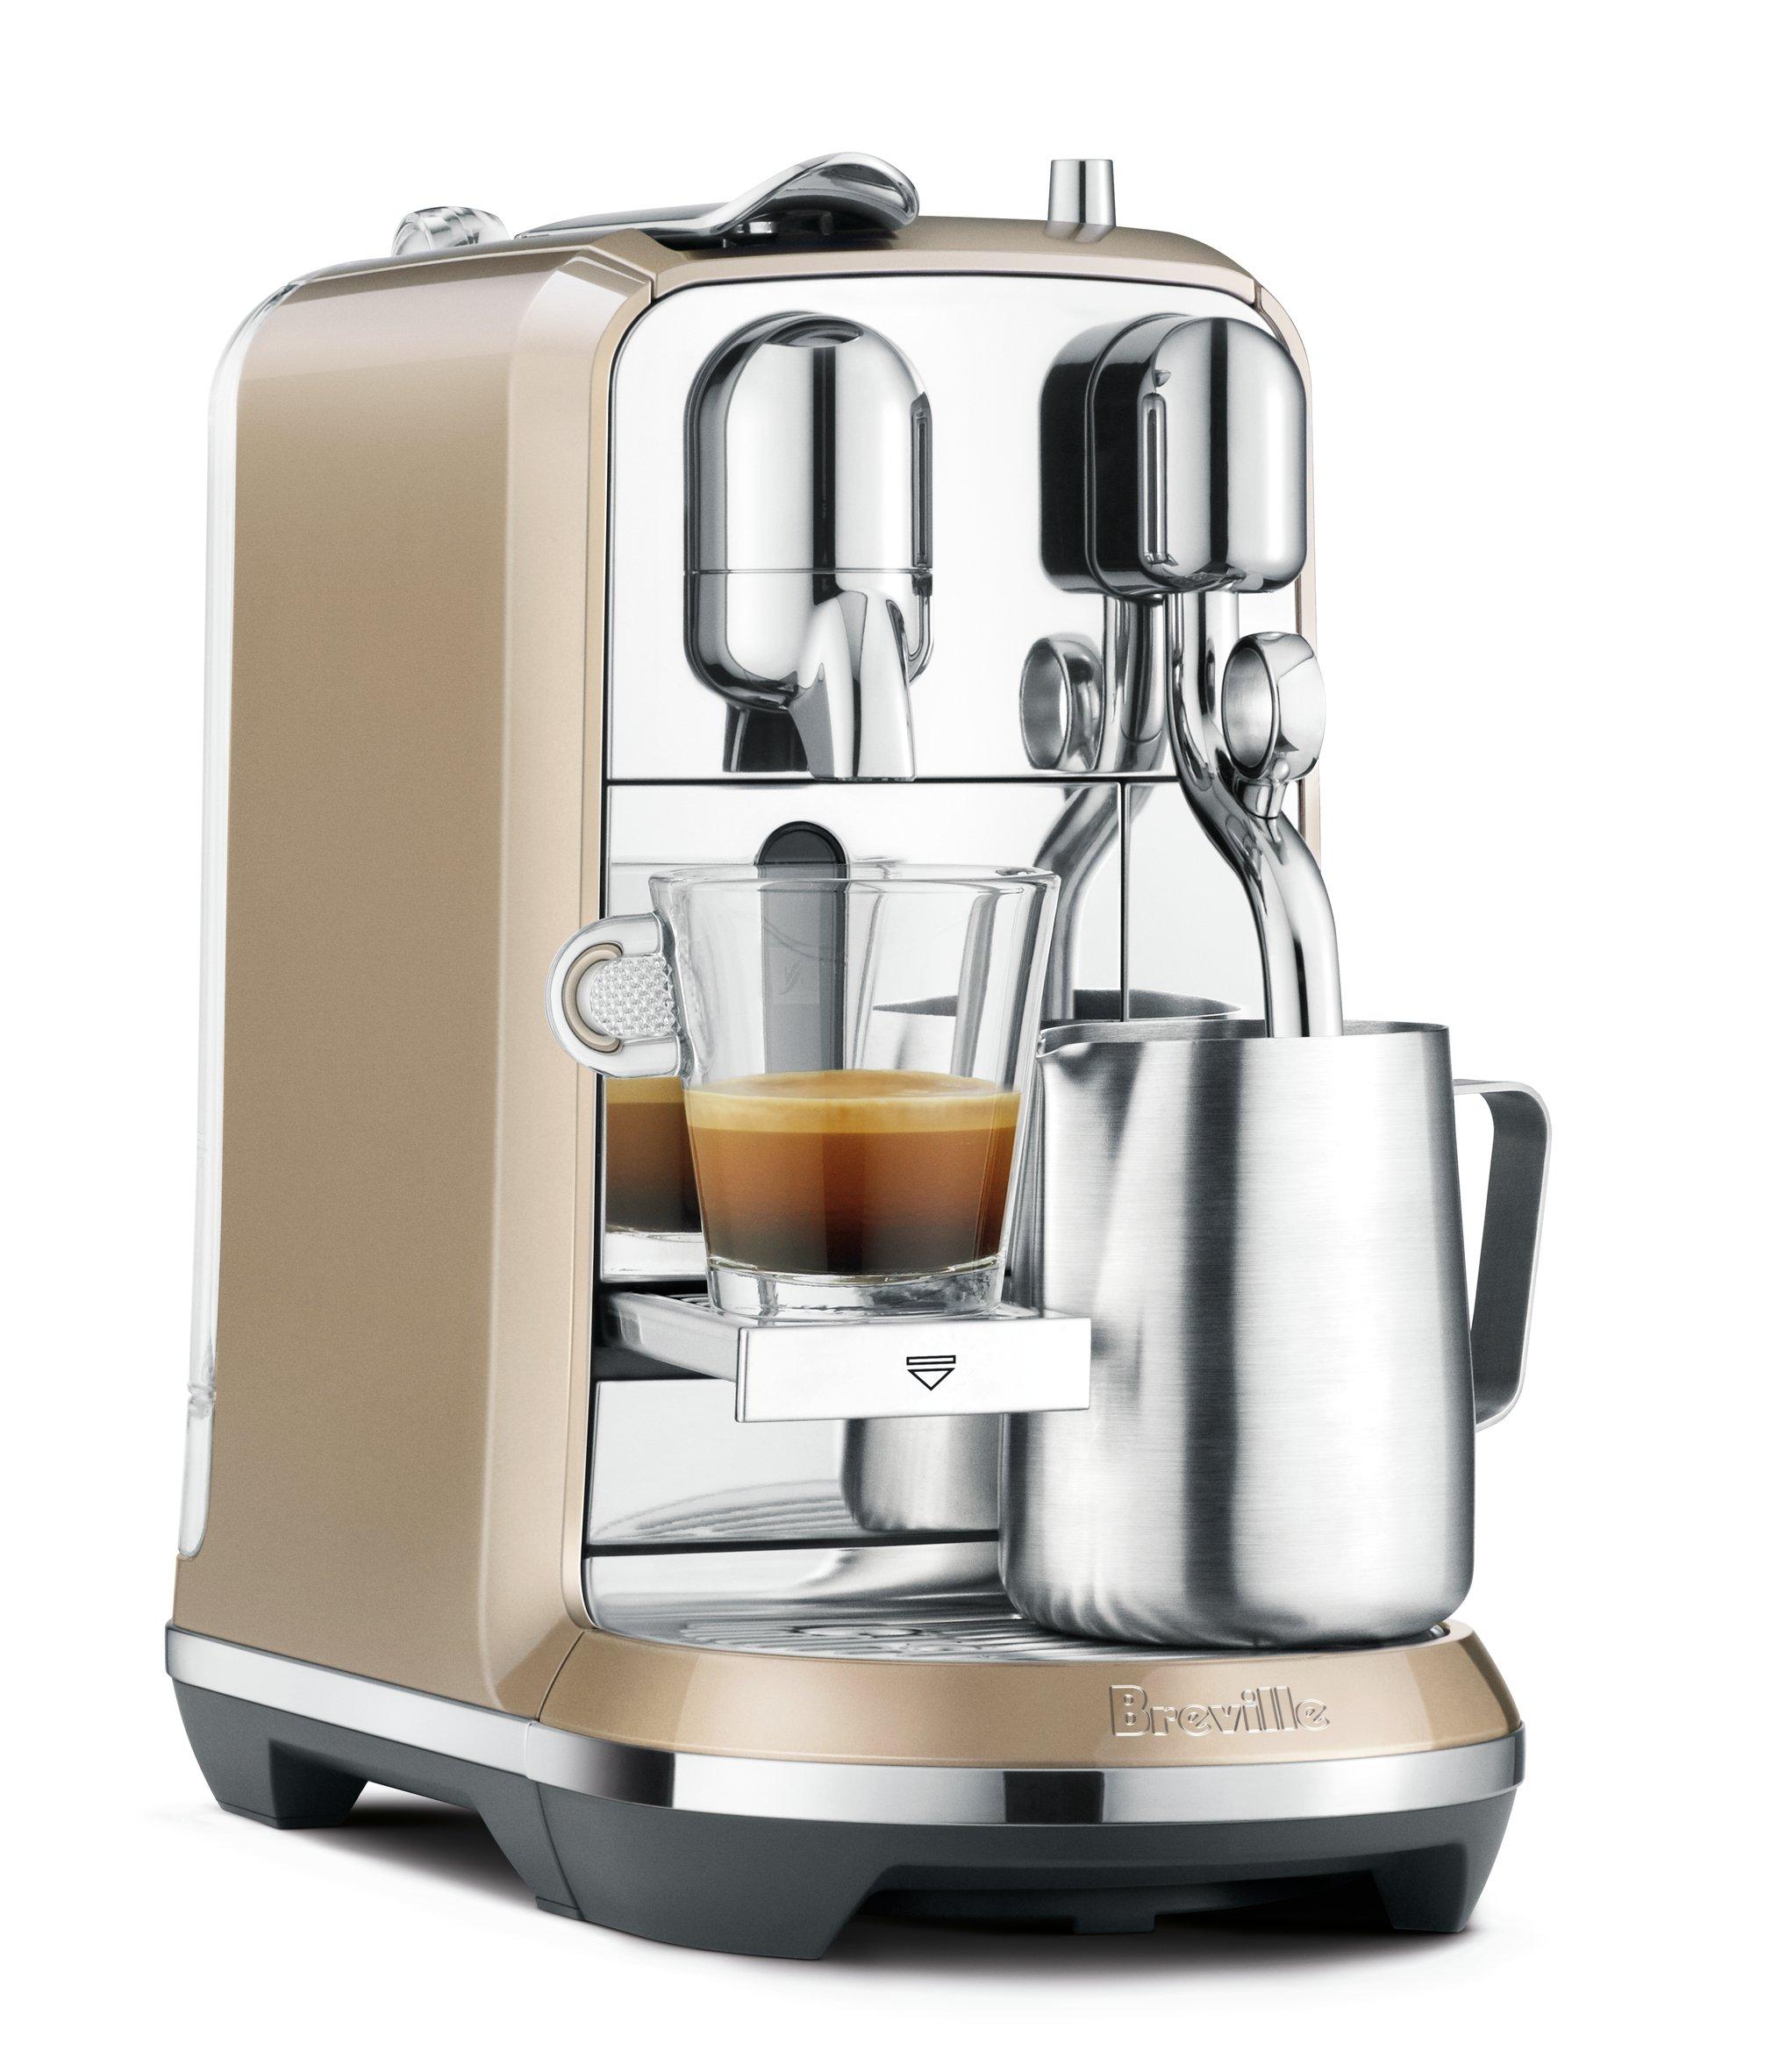 Breville-Nespresso USA Nespresso Creatista Plus Coffee Espresso Machine by Breville-Nespresso USA